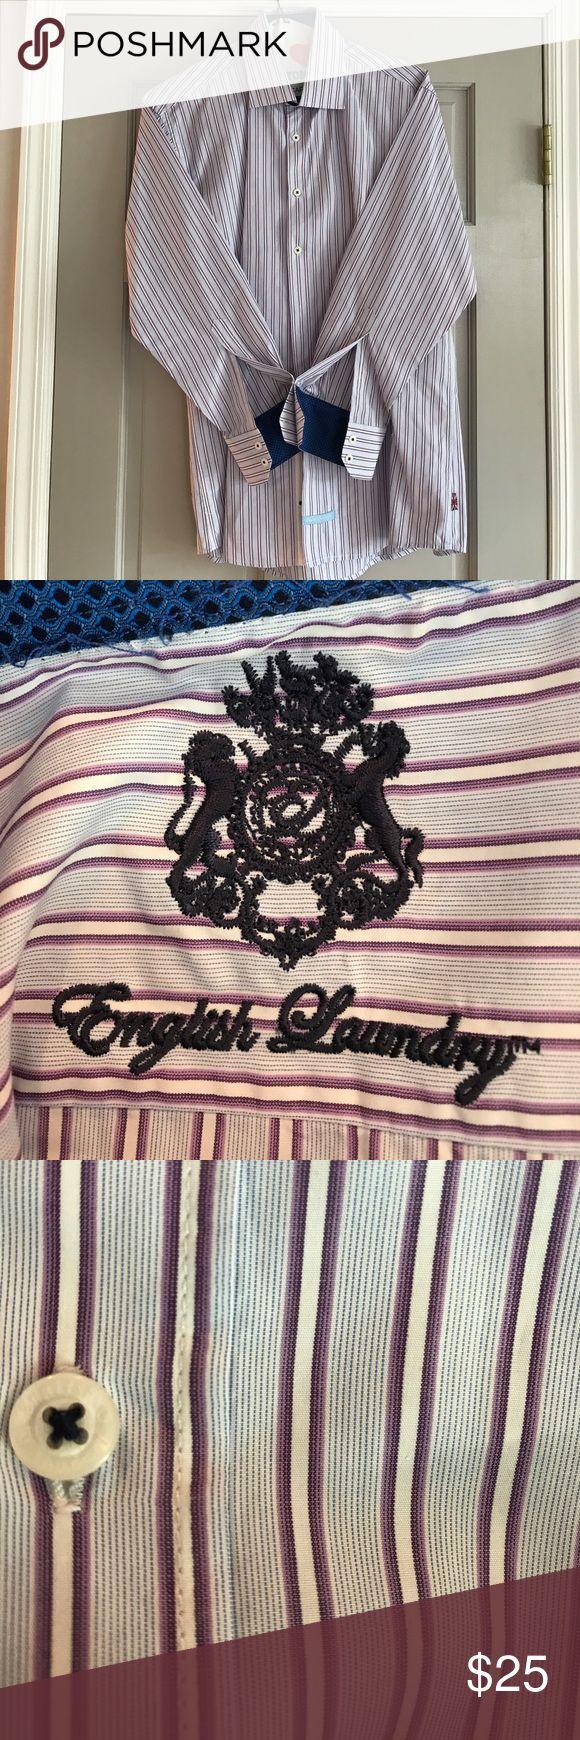 English Laundry dress shirt size 16 32/33 Light blue with purple and white stripes English Laundry Shirts Dress Shirts